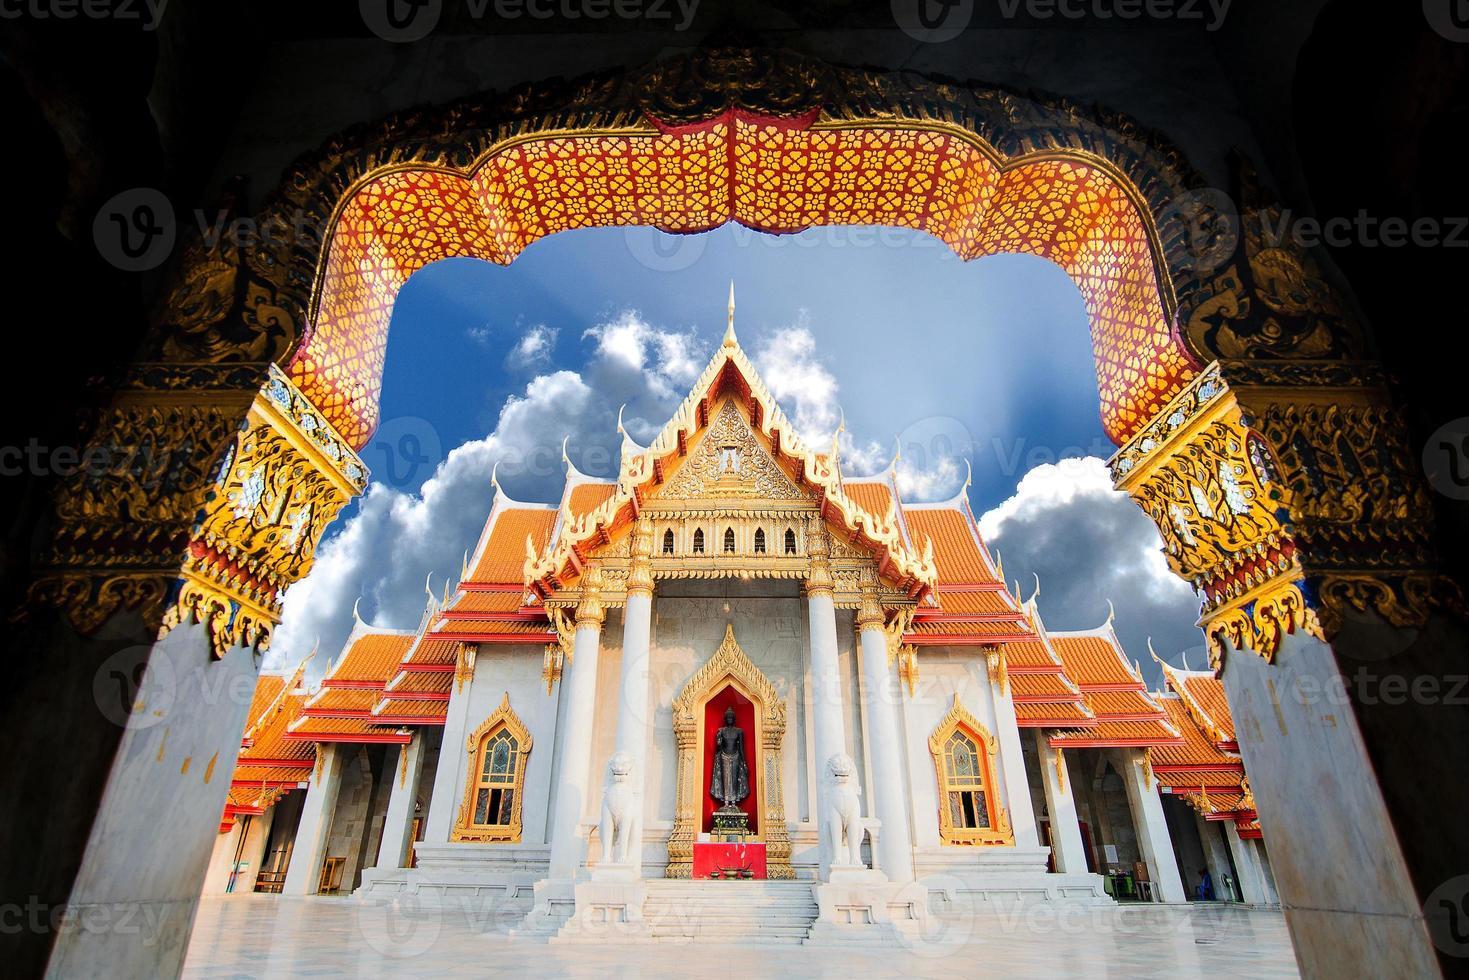 The Marble Temple, Wat Benchamabopitr Bangkok THAILAND photo